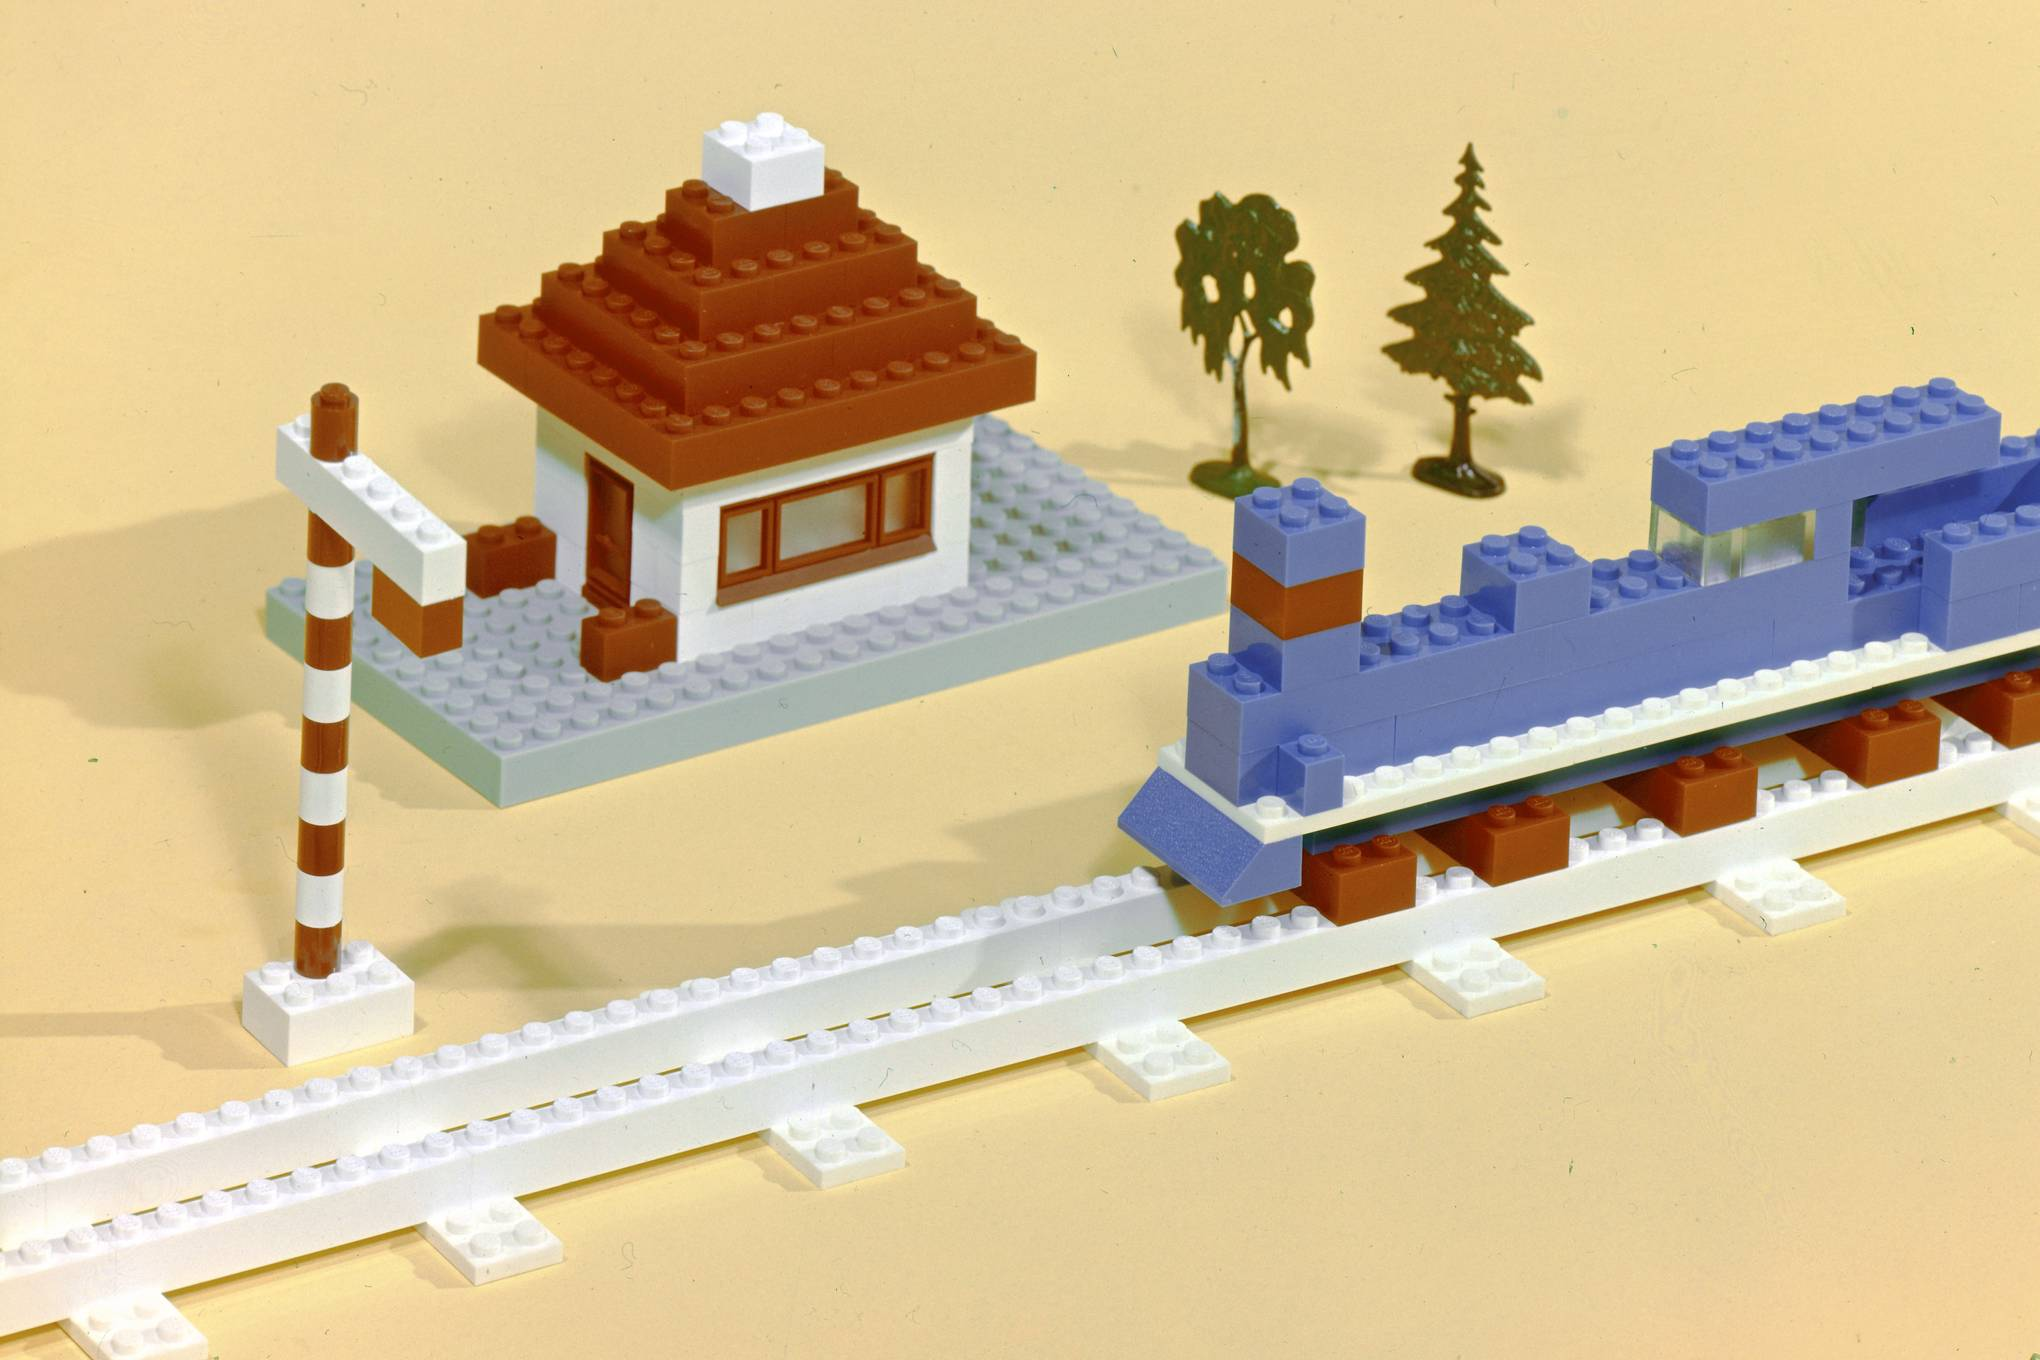 Inside the utopian, brick-loving world of LEGO's adult fandom   WIRED UK